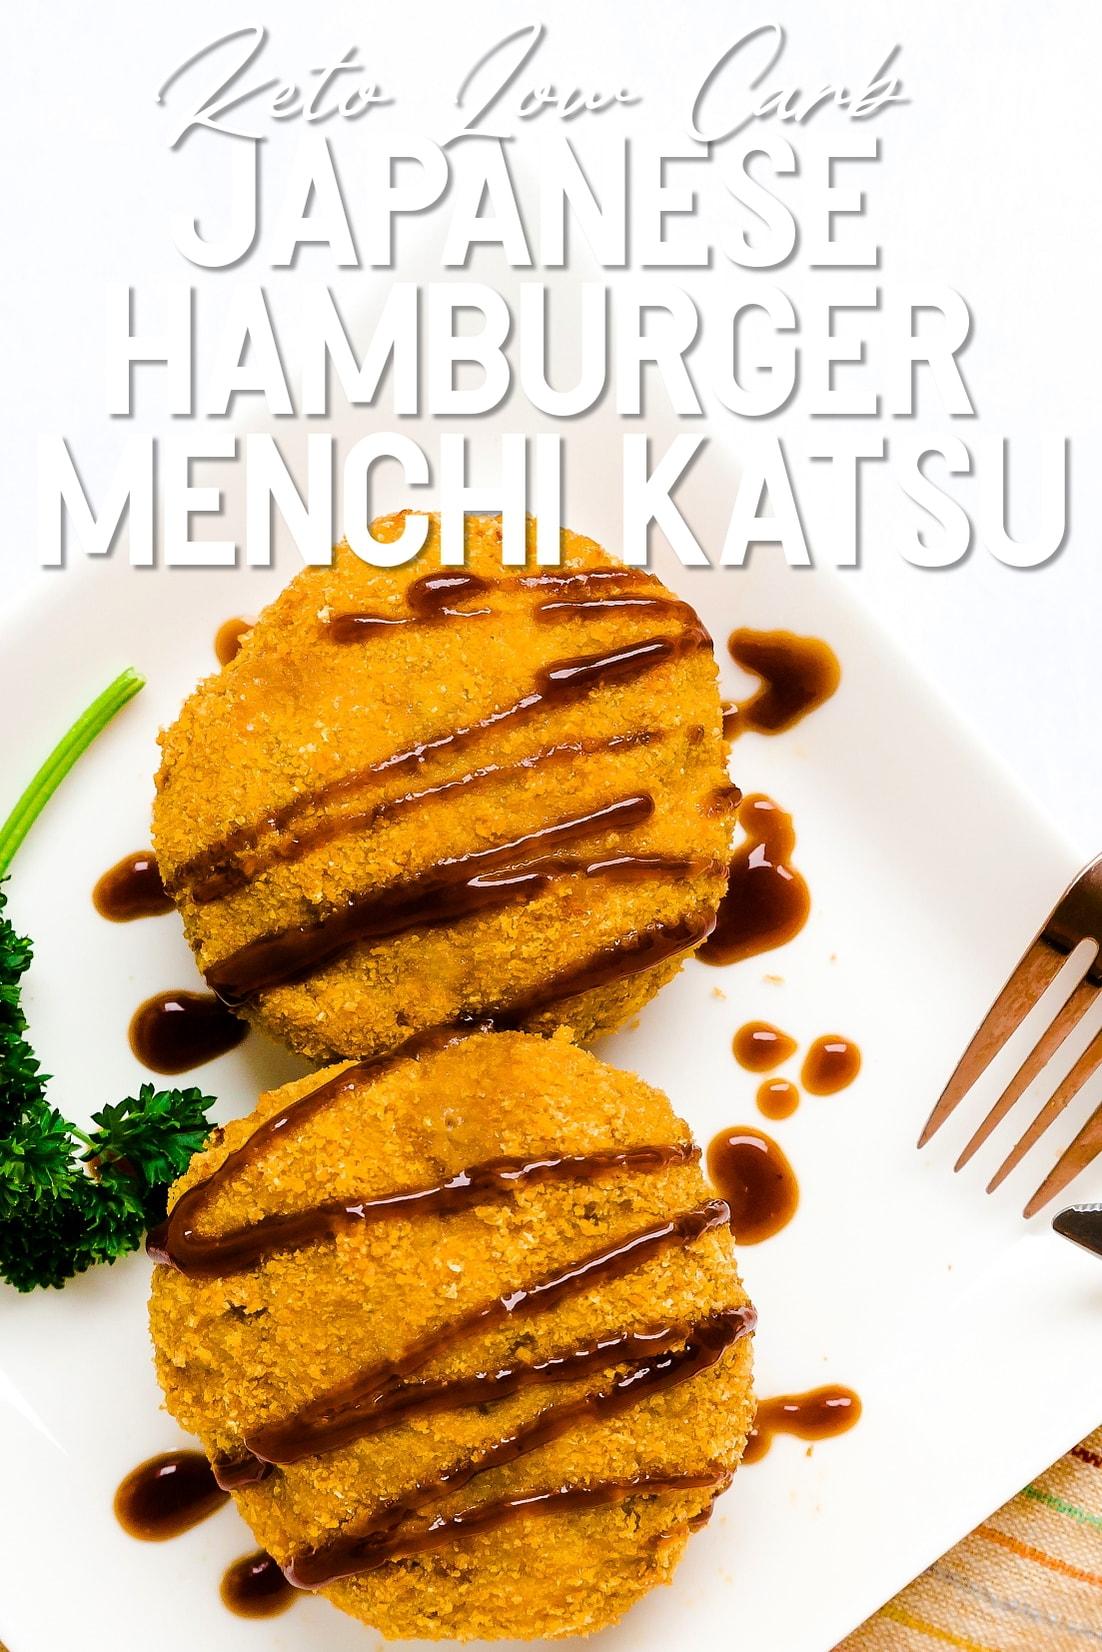 Keto Japanese Hamburger Cutlet Menchi Katsu with tonkatsu sauce served on a white plate